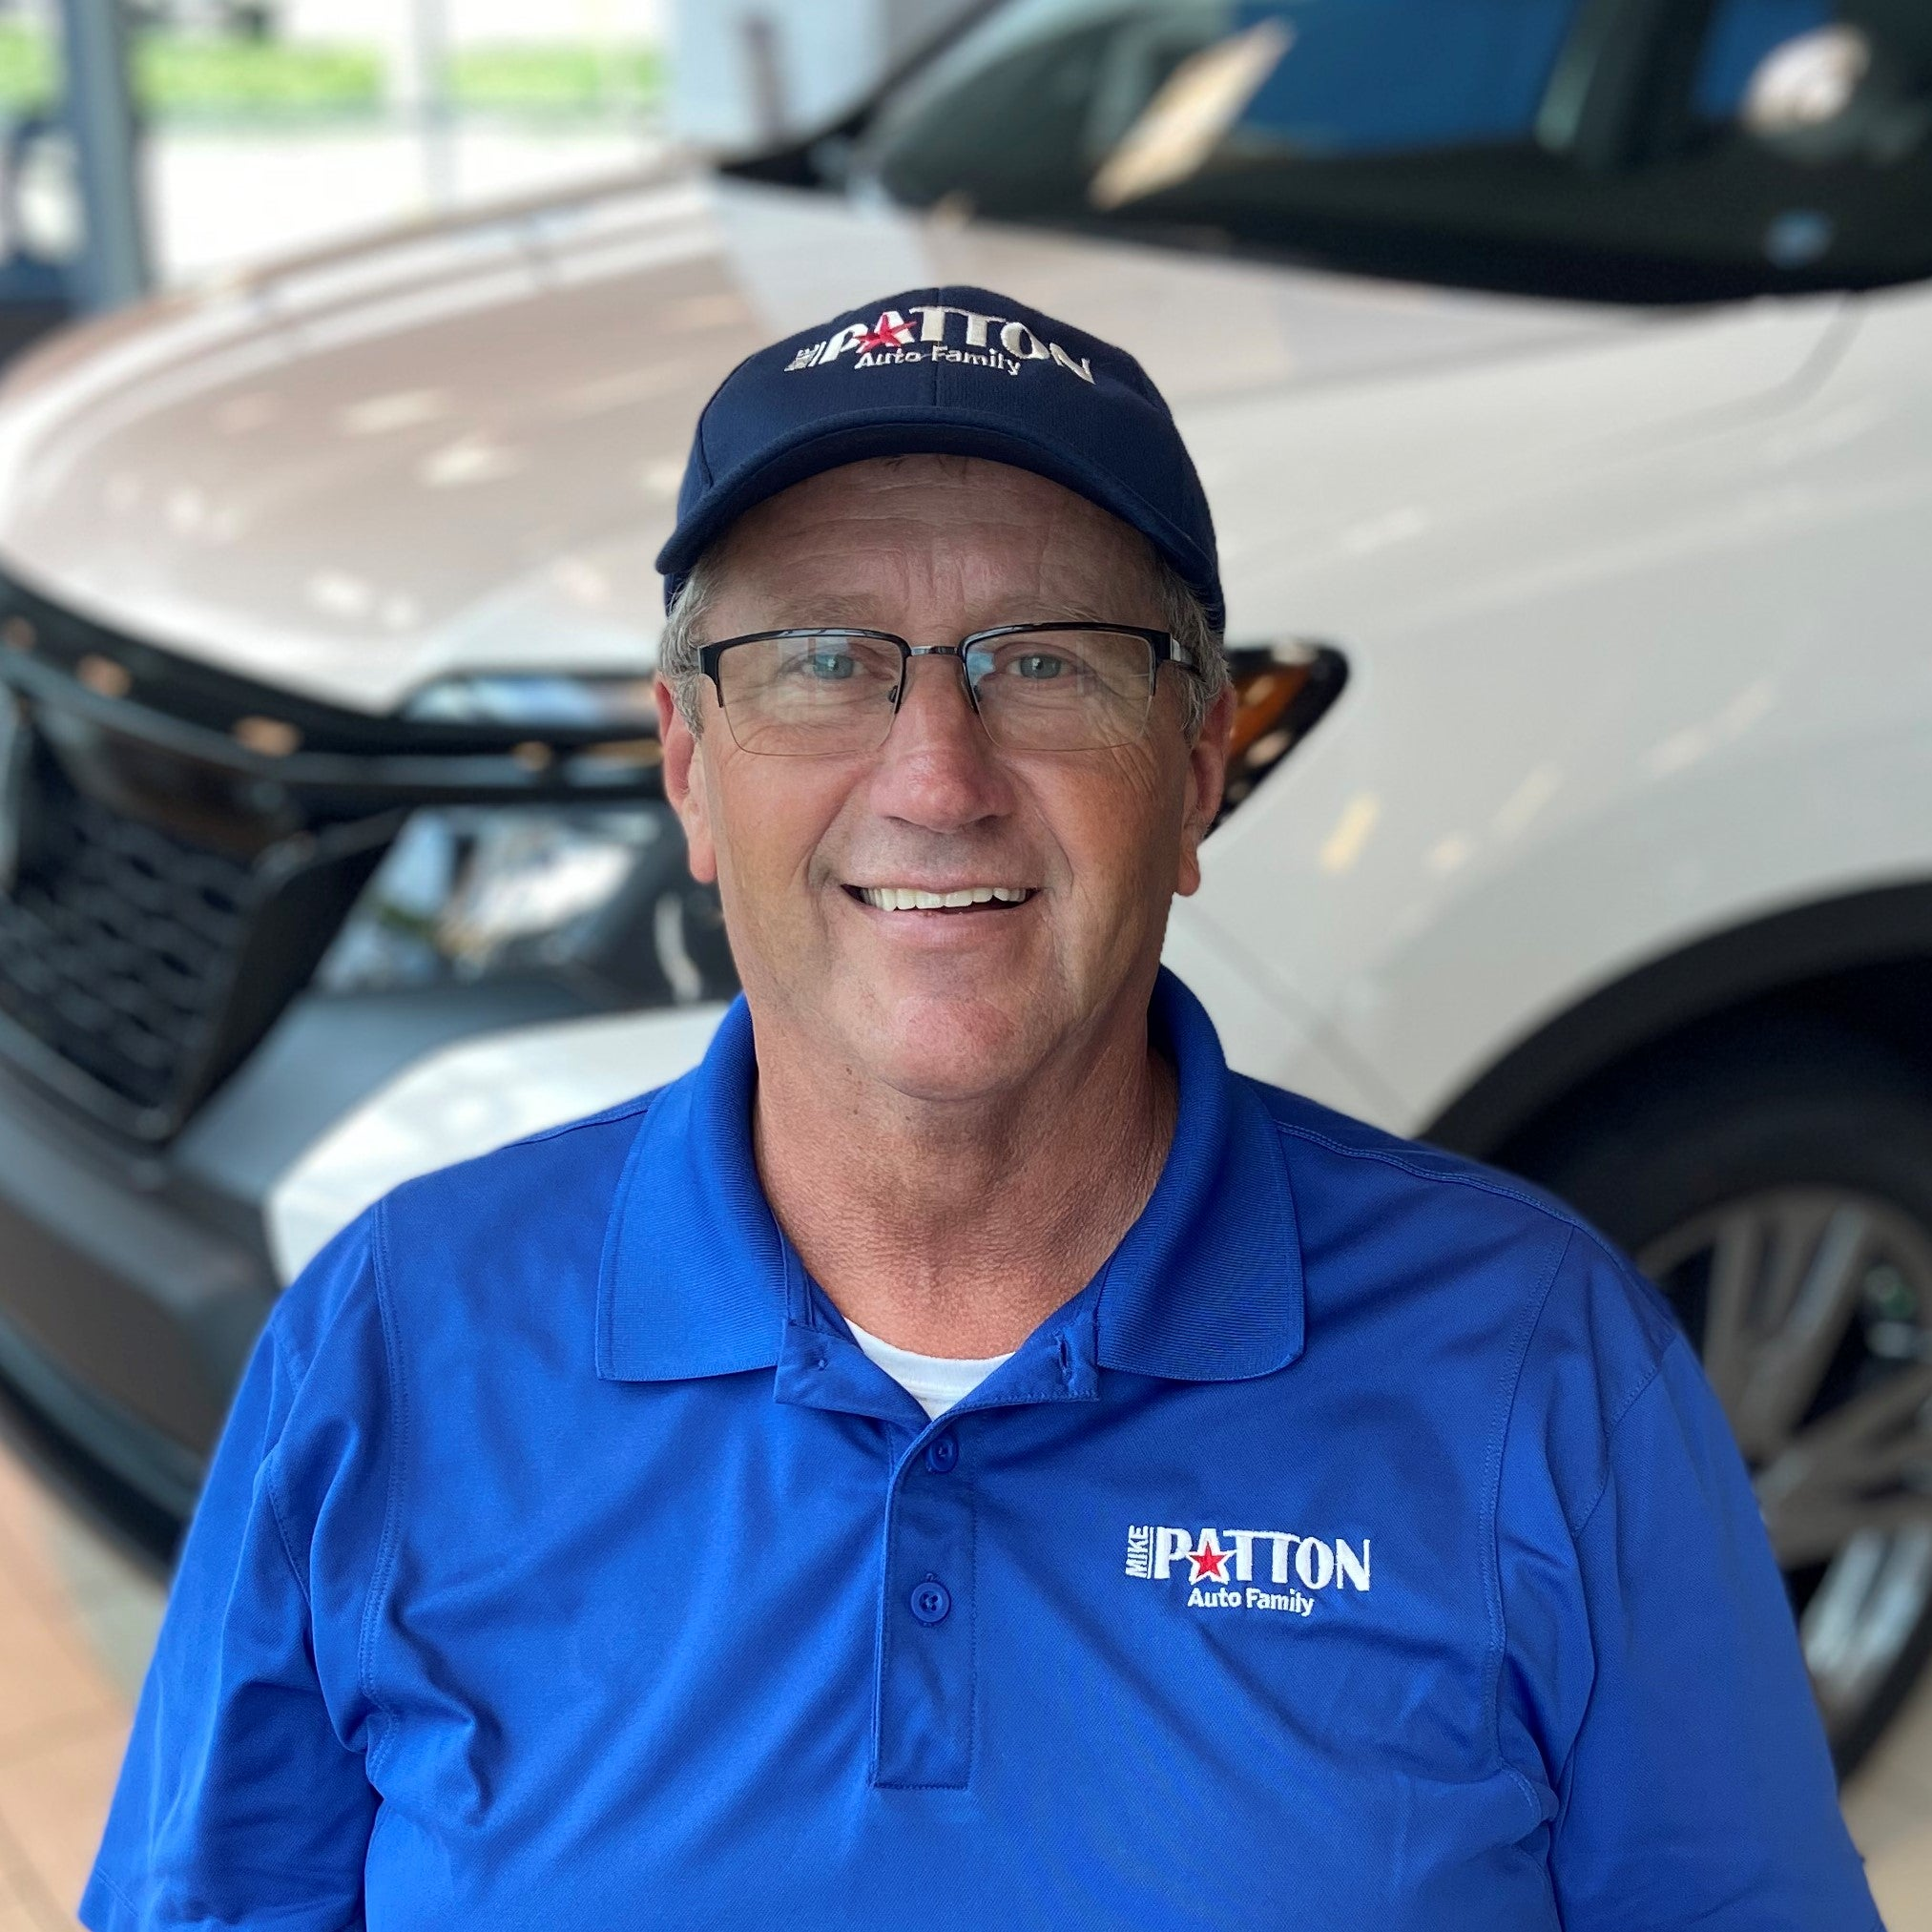 Mike Patton Lagrange Ga >> Mike Patton Honda - Mike Patton Honda Staff - LaGrange, Ga ...